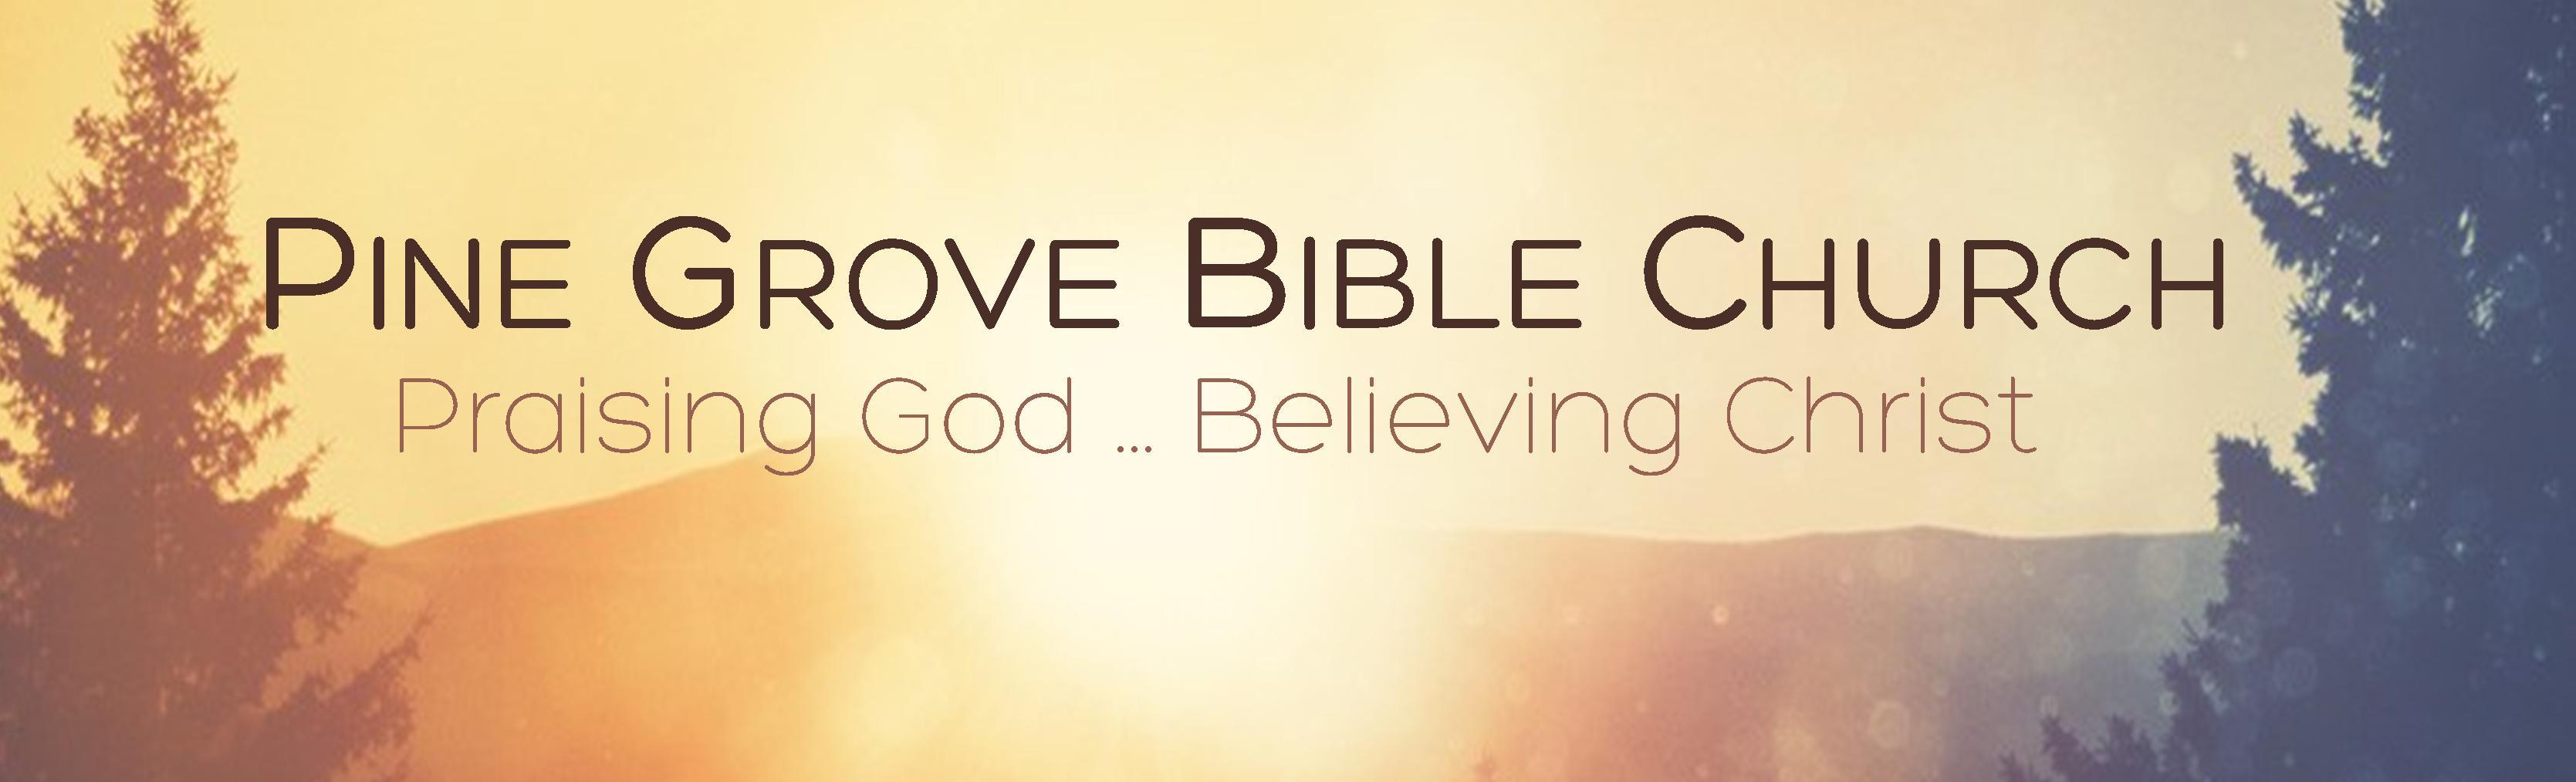 pgbc-praise-god1